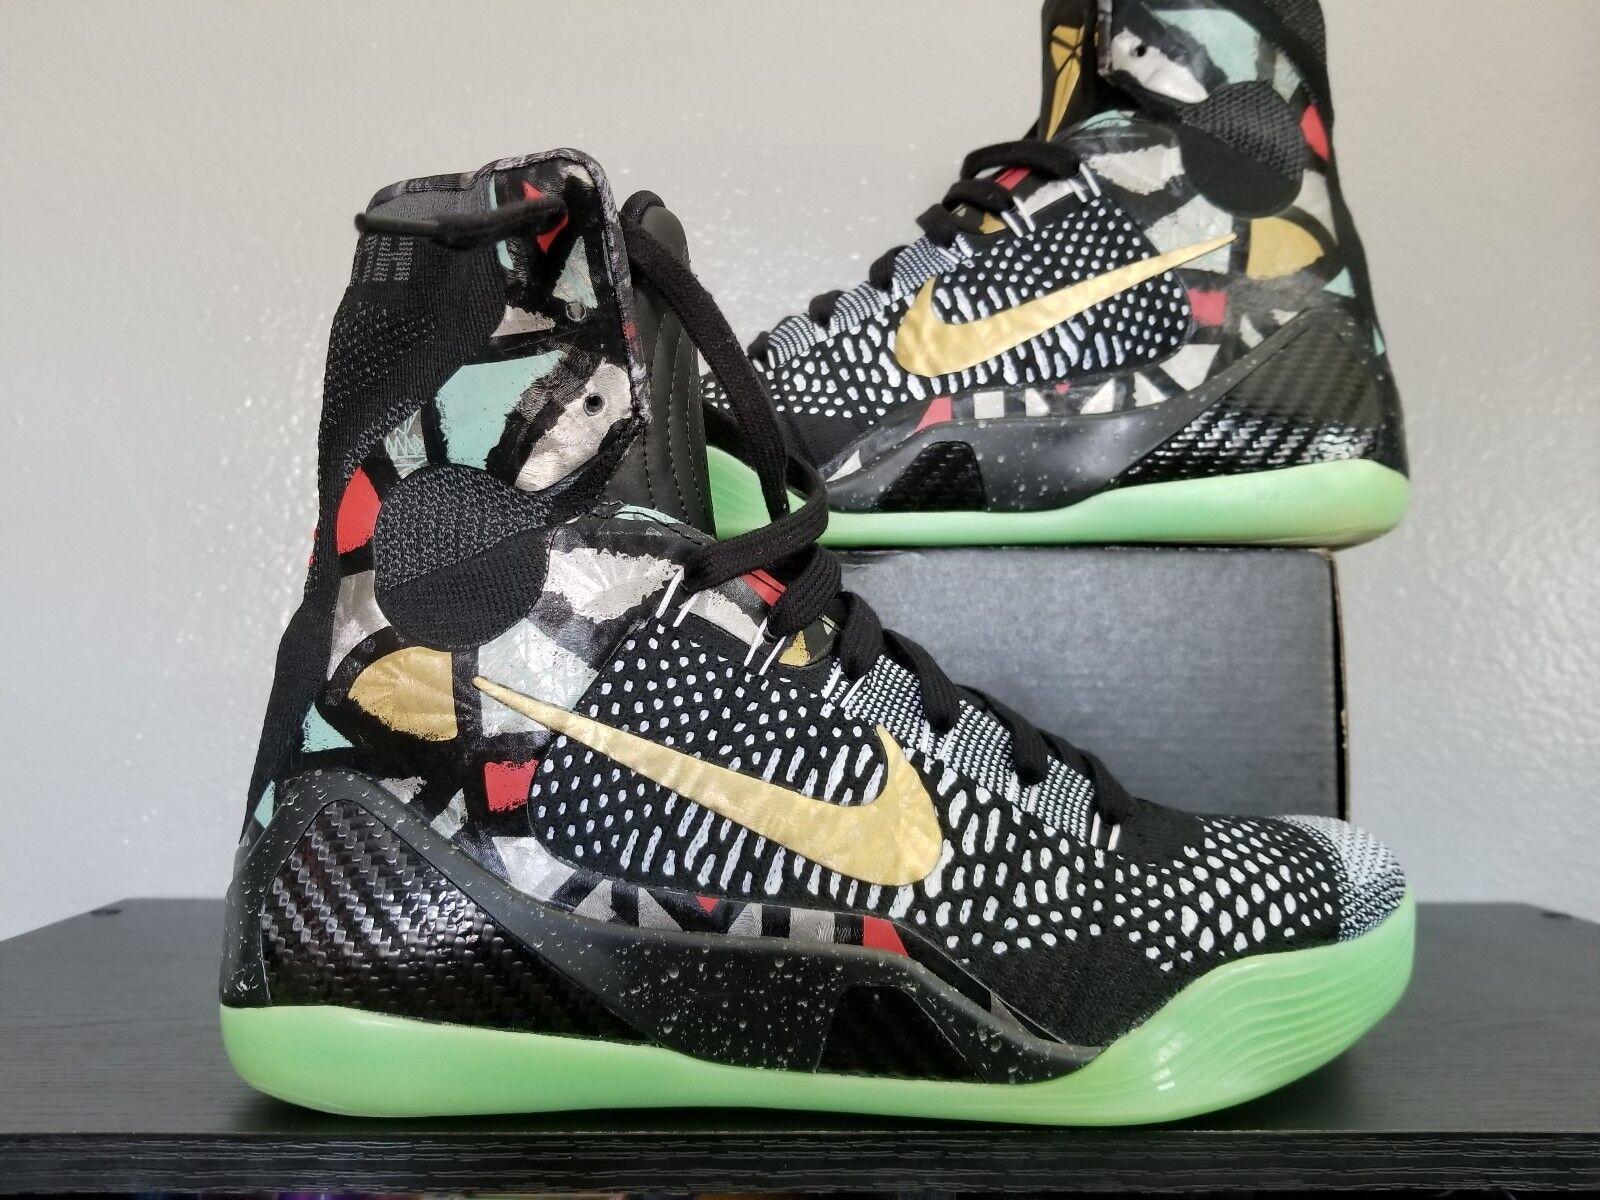 Nike kobe ix 9 elite nba all - star gumbo 630847 002 sz 10 lakers bryant mamba